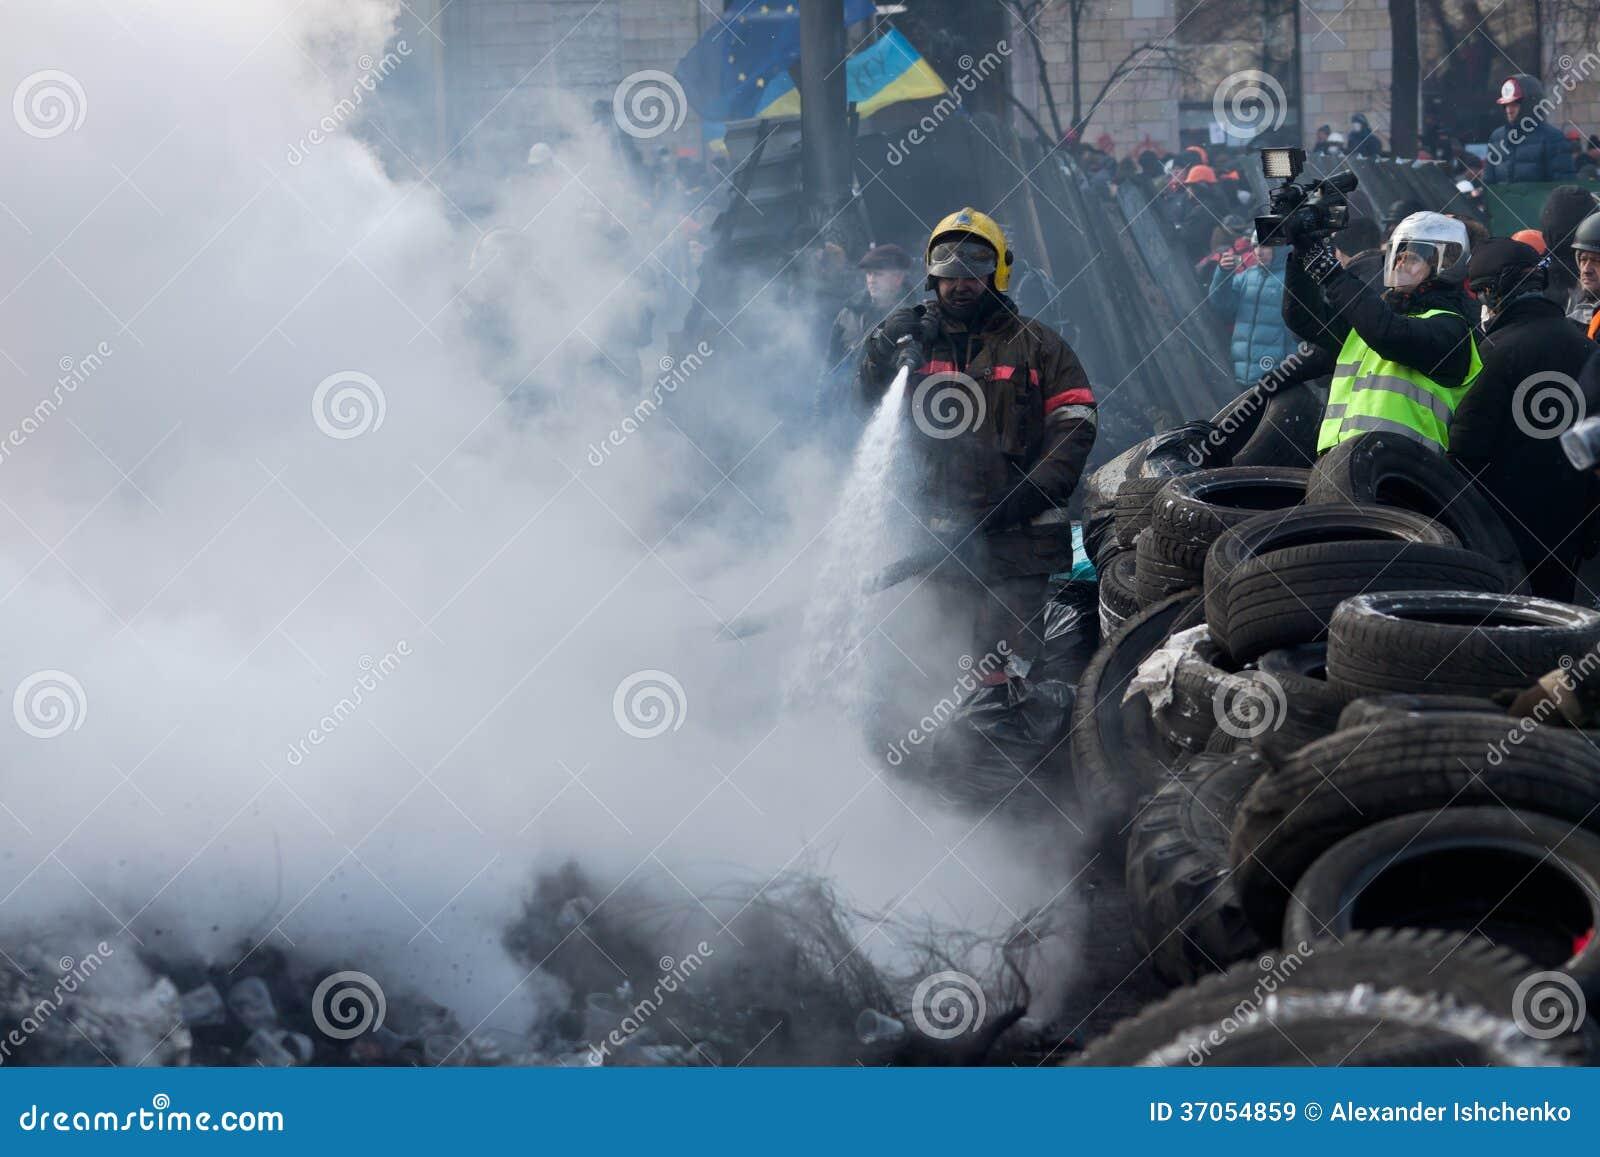 KIEV  UKRAINE - 23 JANUARY 2014  Firefighters extinguish a fire at the    Ukraine Revolution Fire